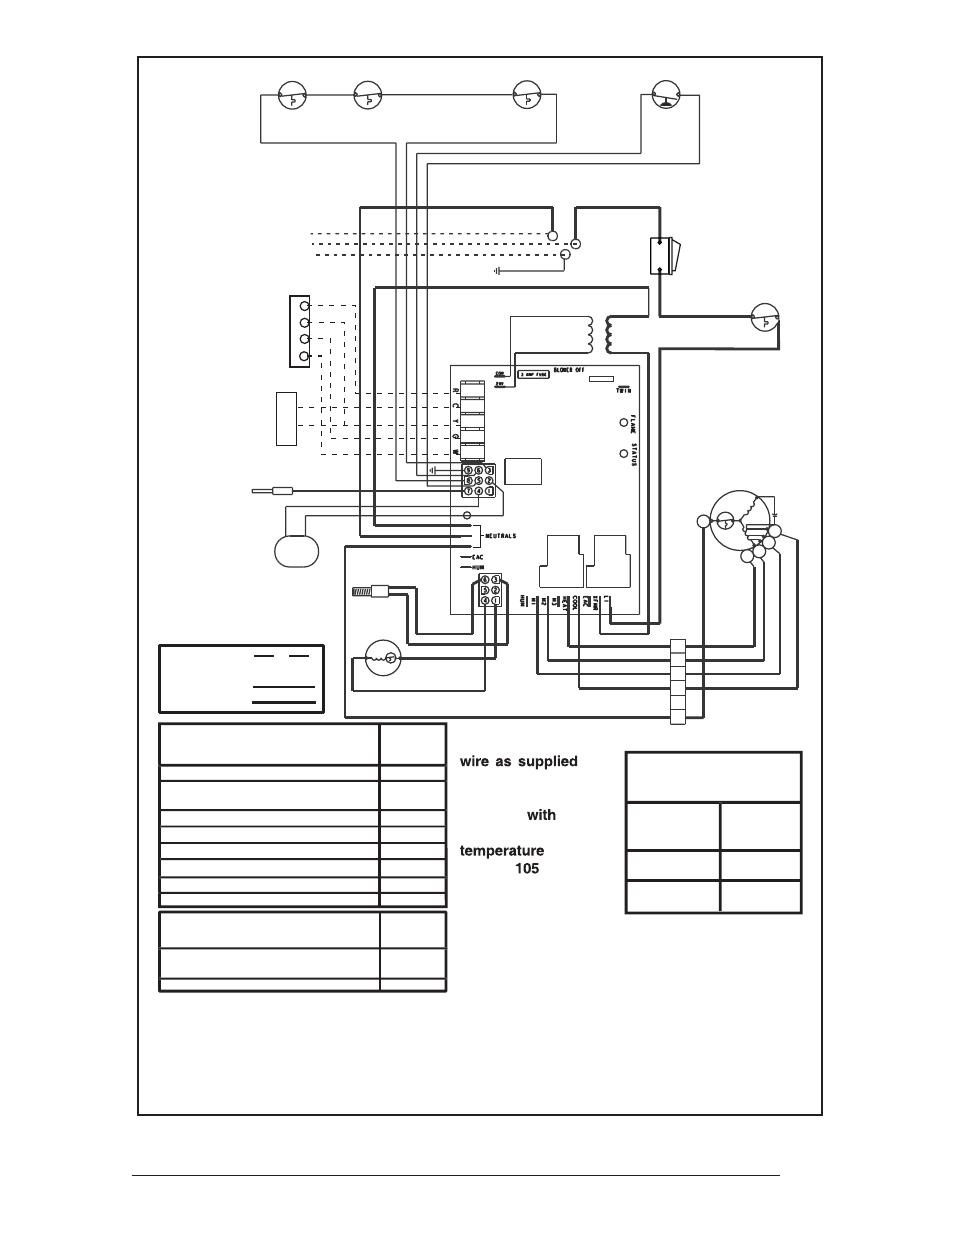 33 figure 30. downflow furnace wiring diagram, Legend